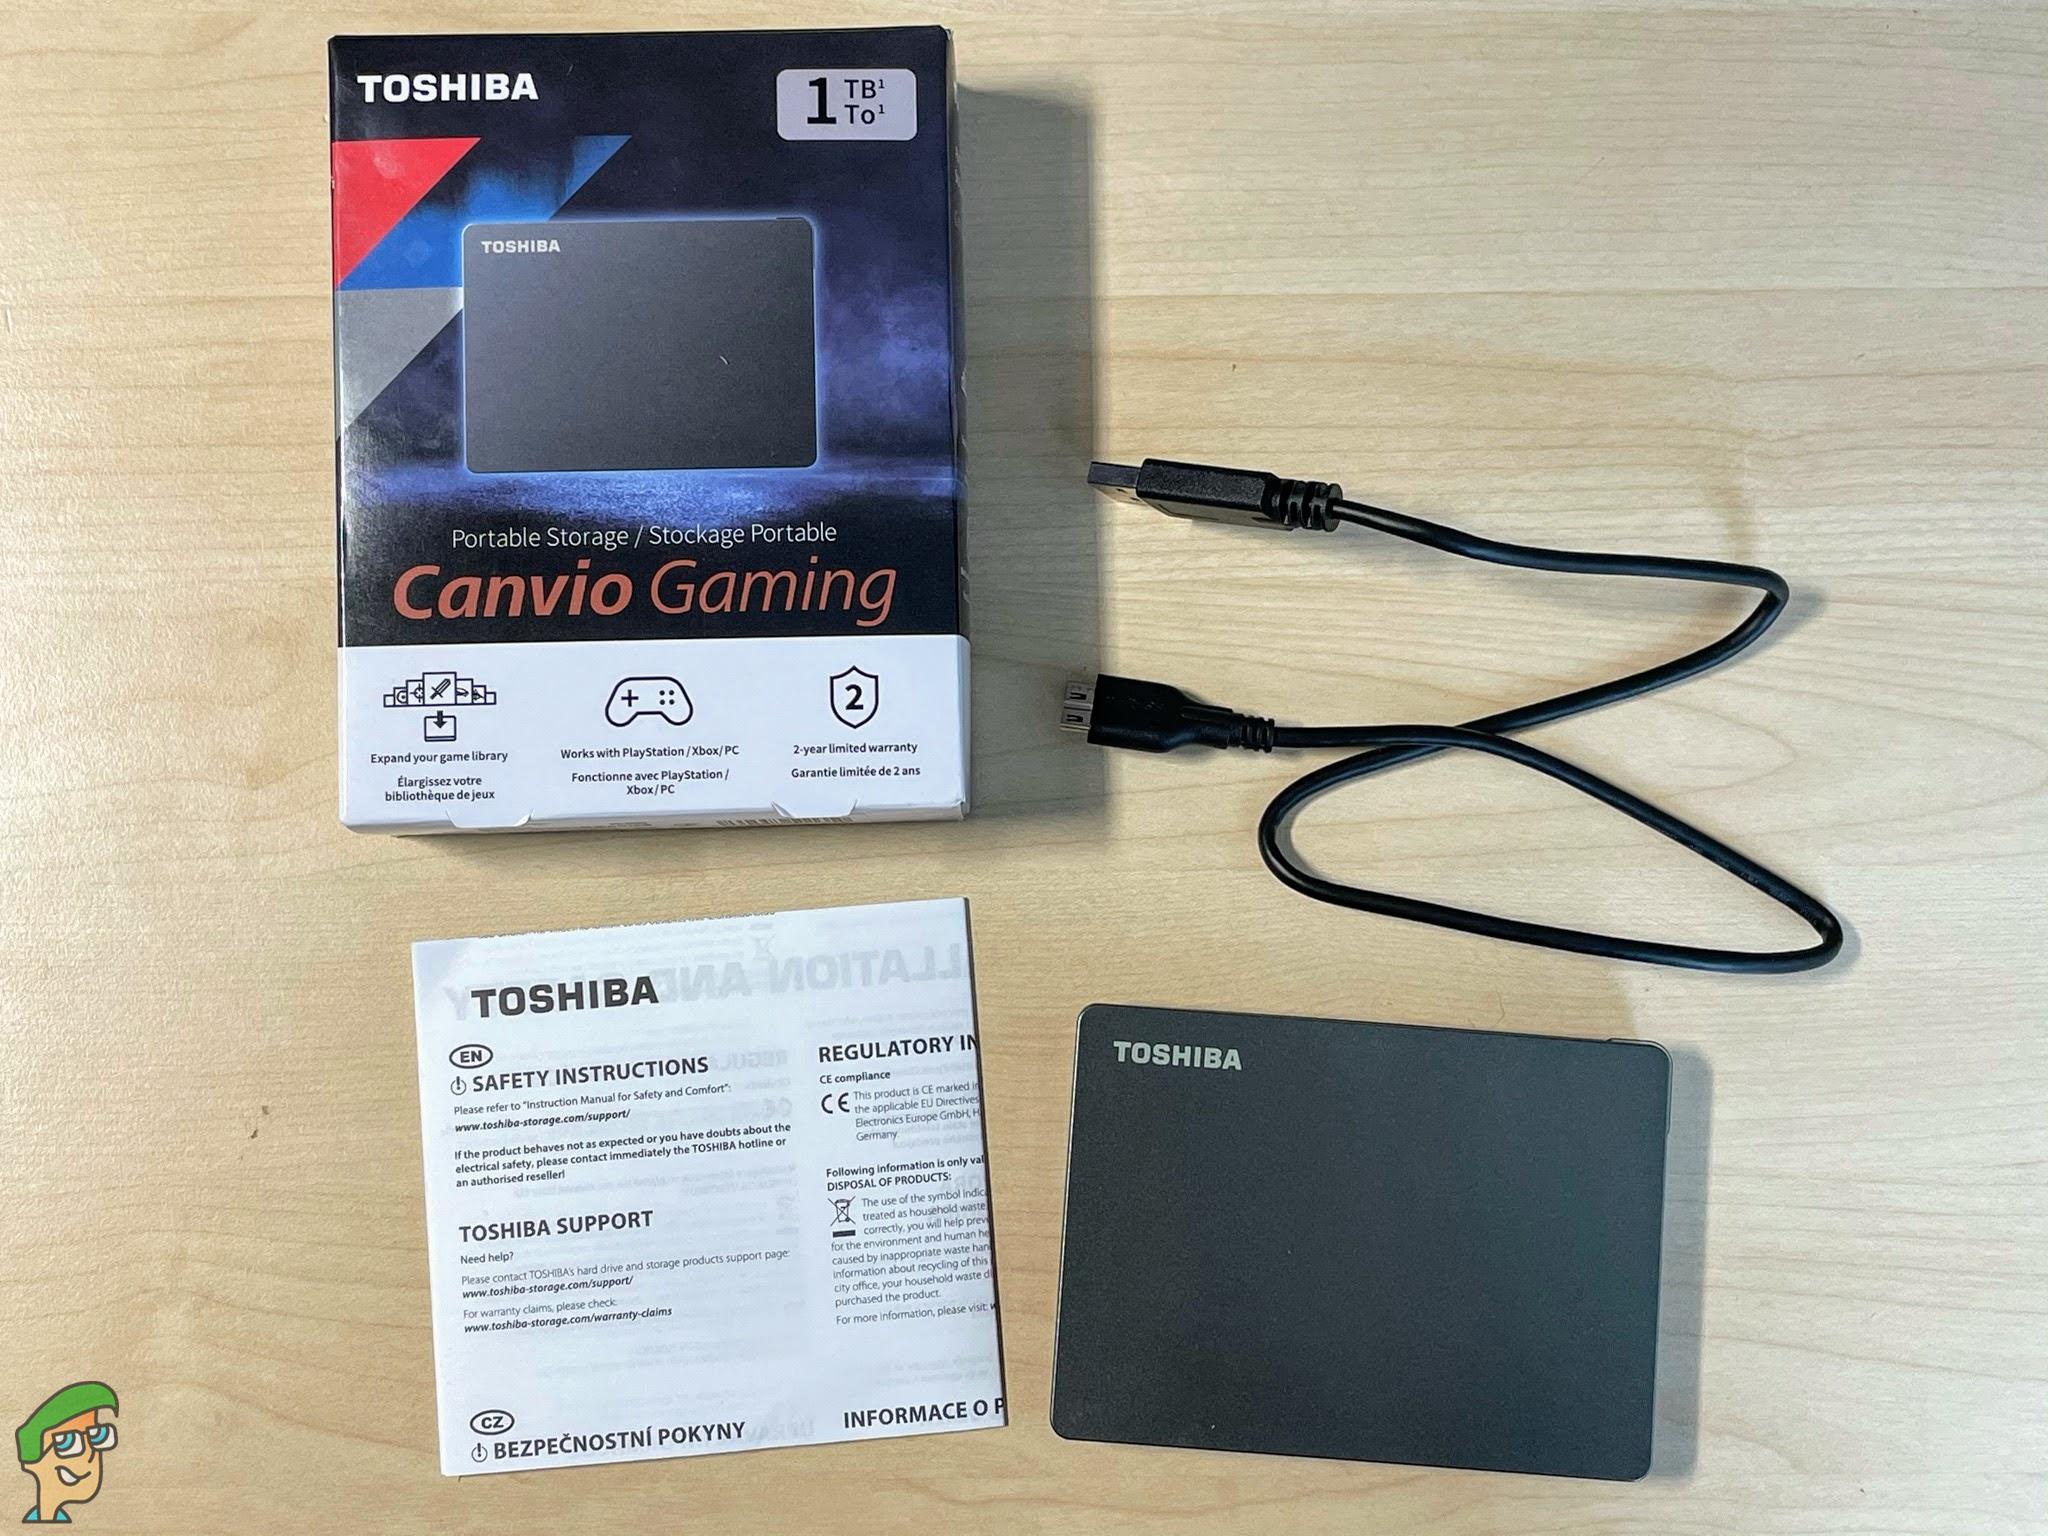 Toshiba Canvio Gaming